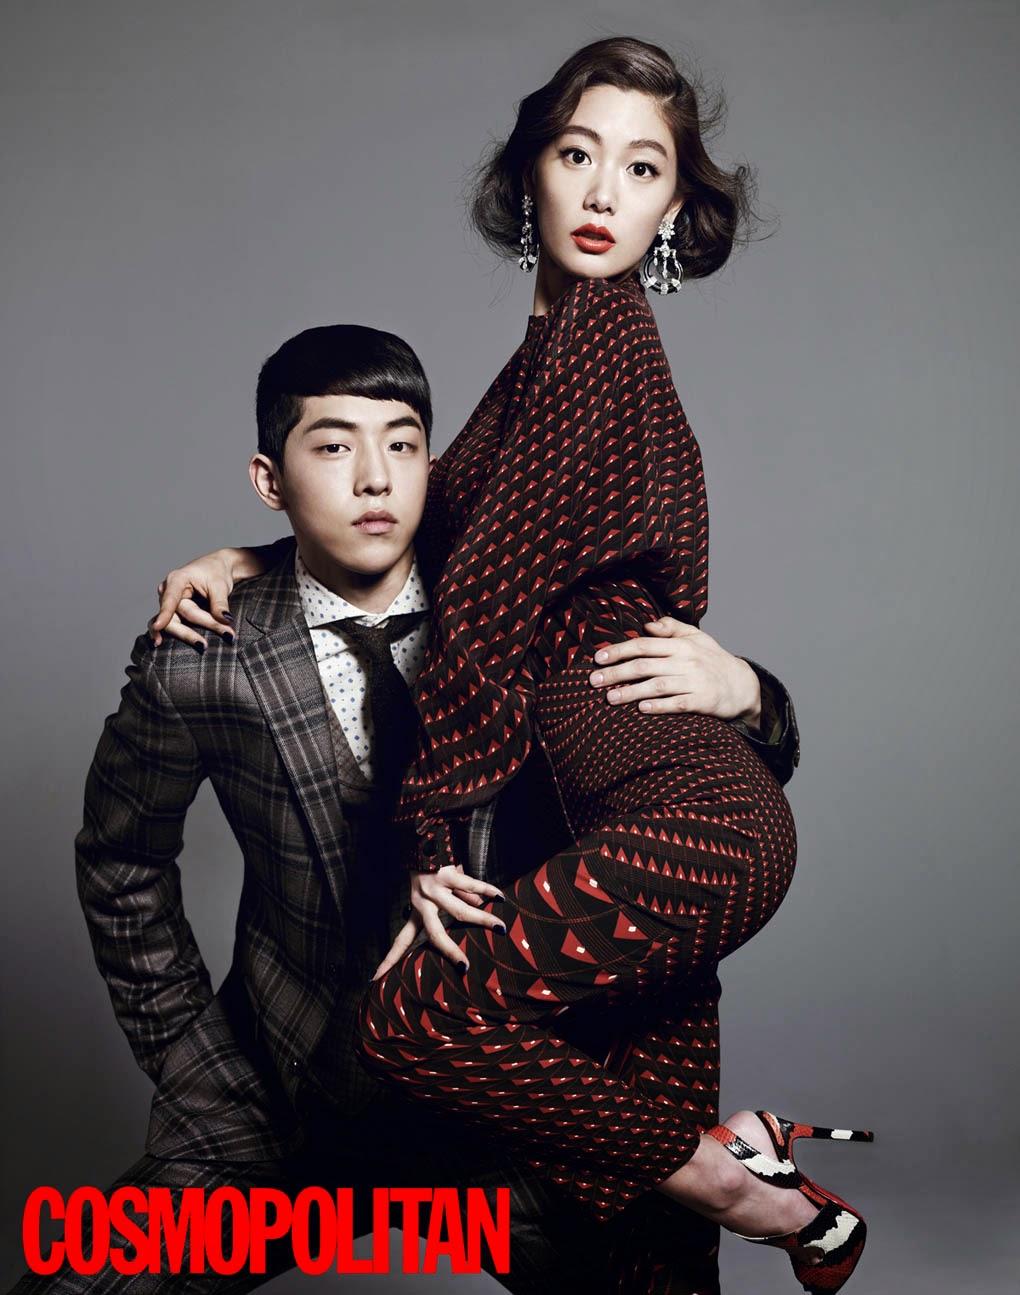 Clara Lee - Cosmopolitan Magazine February Issue 2014